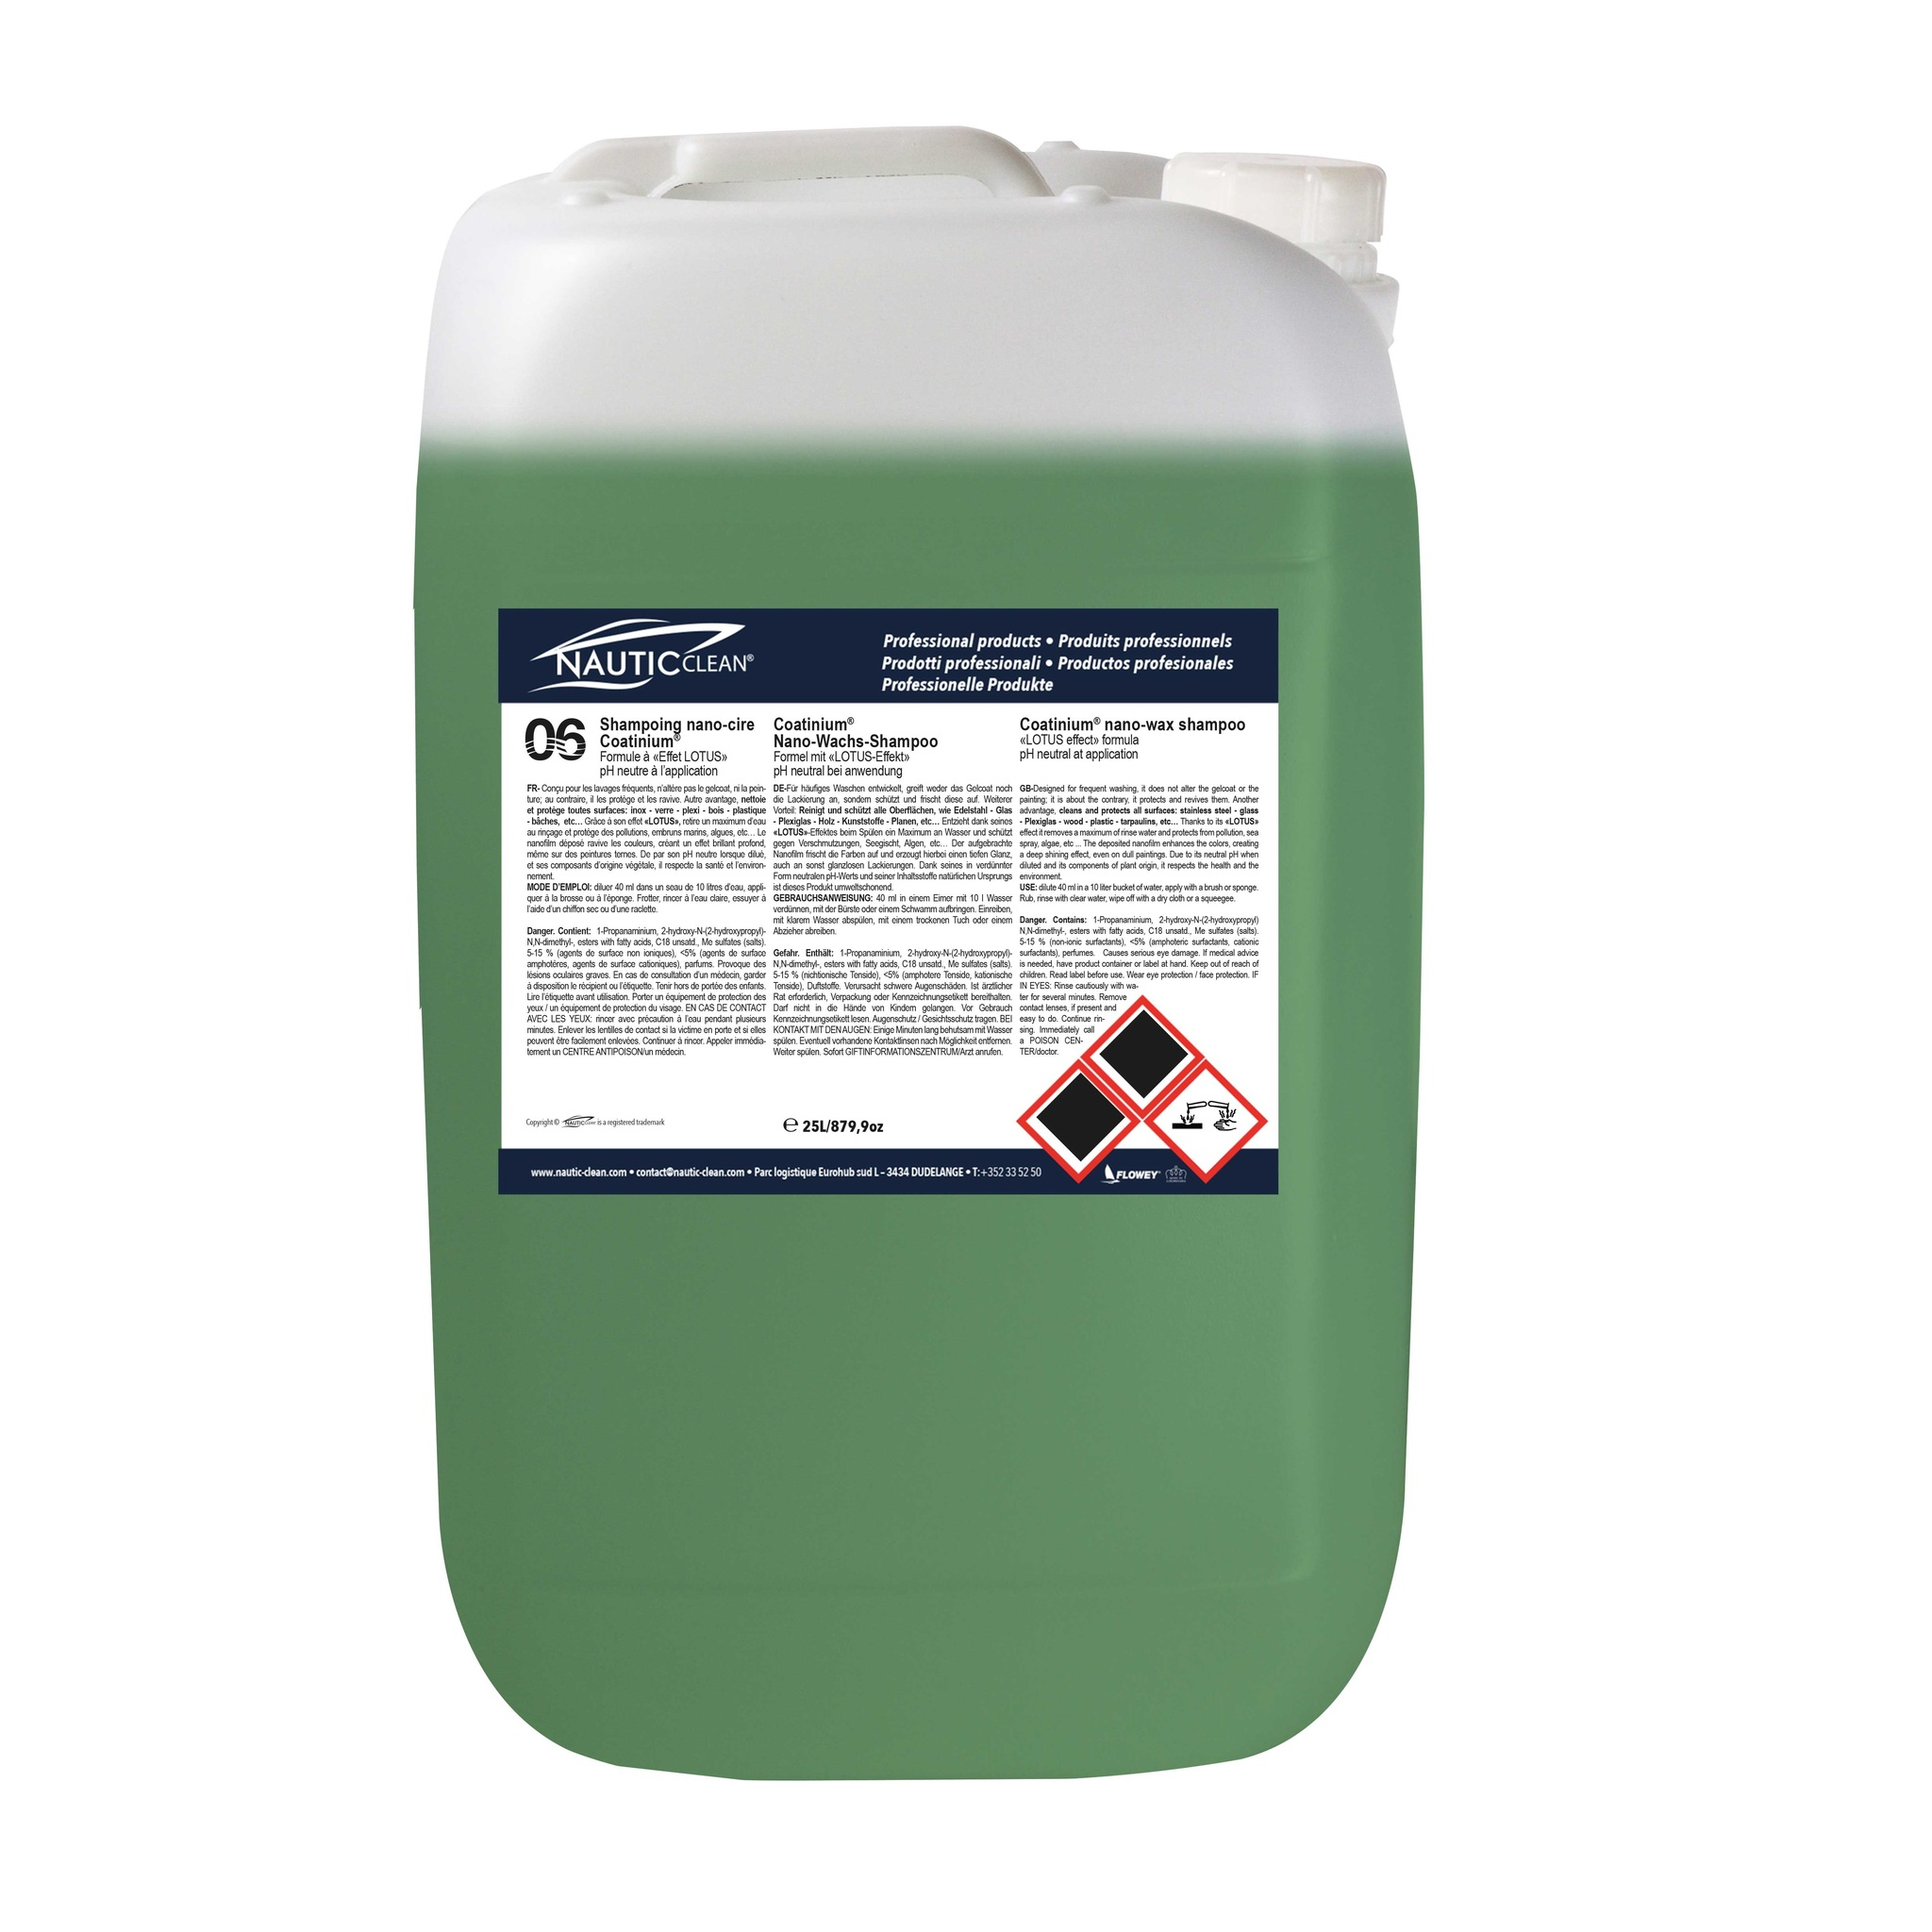 Coatinium® nano-wax shampoo №06